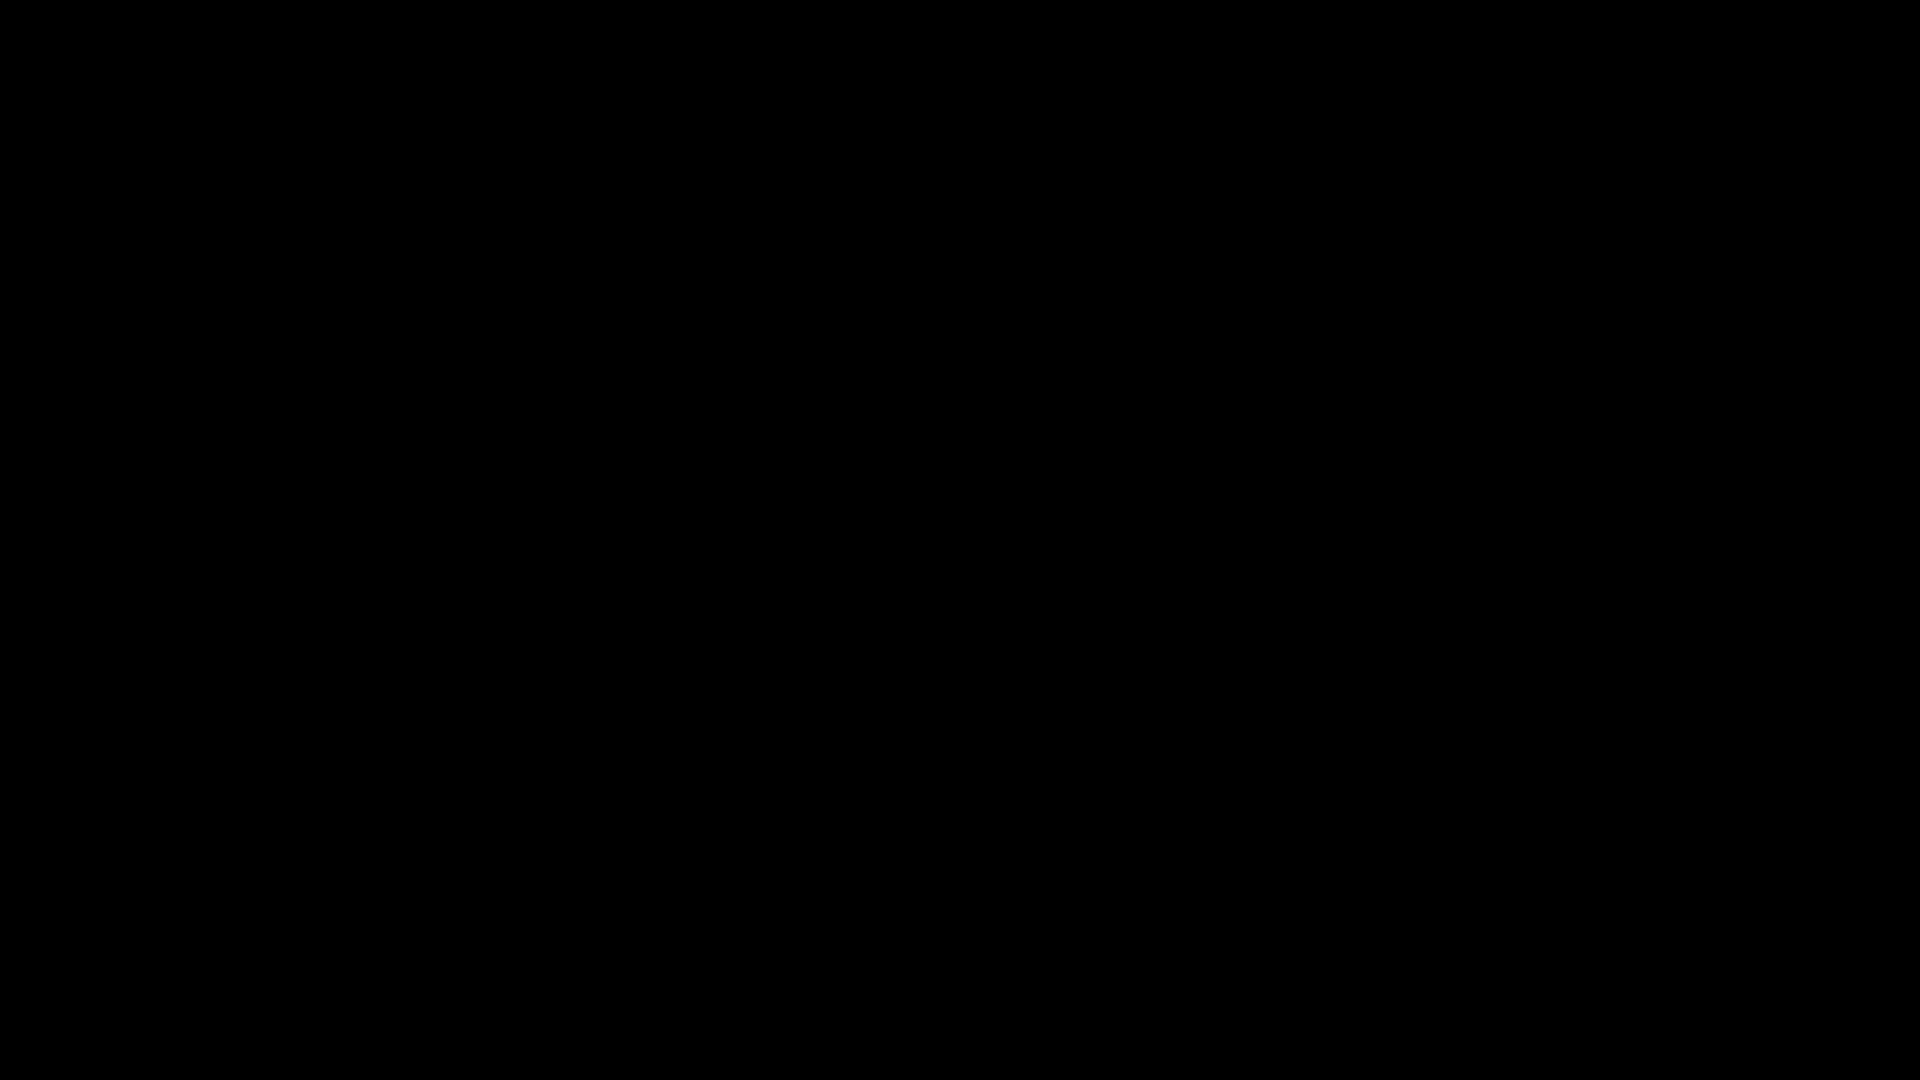 Chocobo, Chocobo's Dungeon 2, Chocobo's magical dungeon, Chocobo's mysterious dungeon, Final Fantasy, Final Fantasy (video Game), Jonatan, Kevin, Limey, Square, Glorious Ducks GIFs